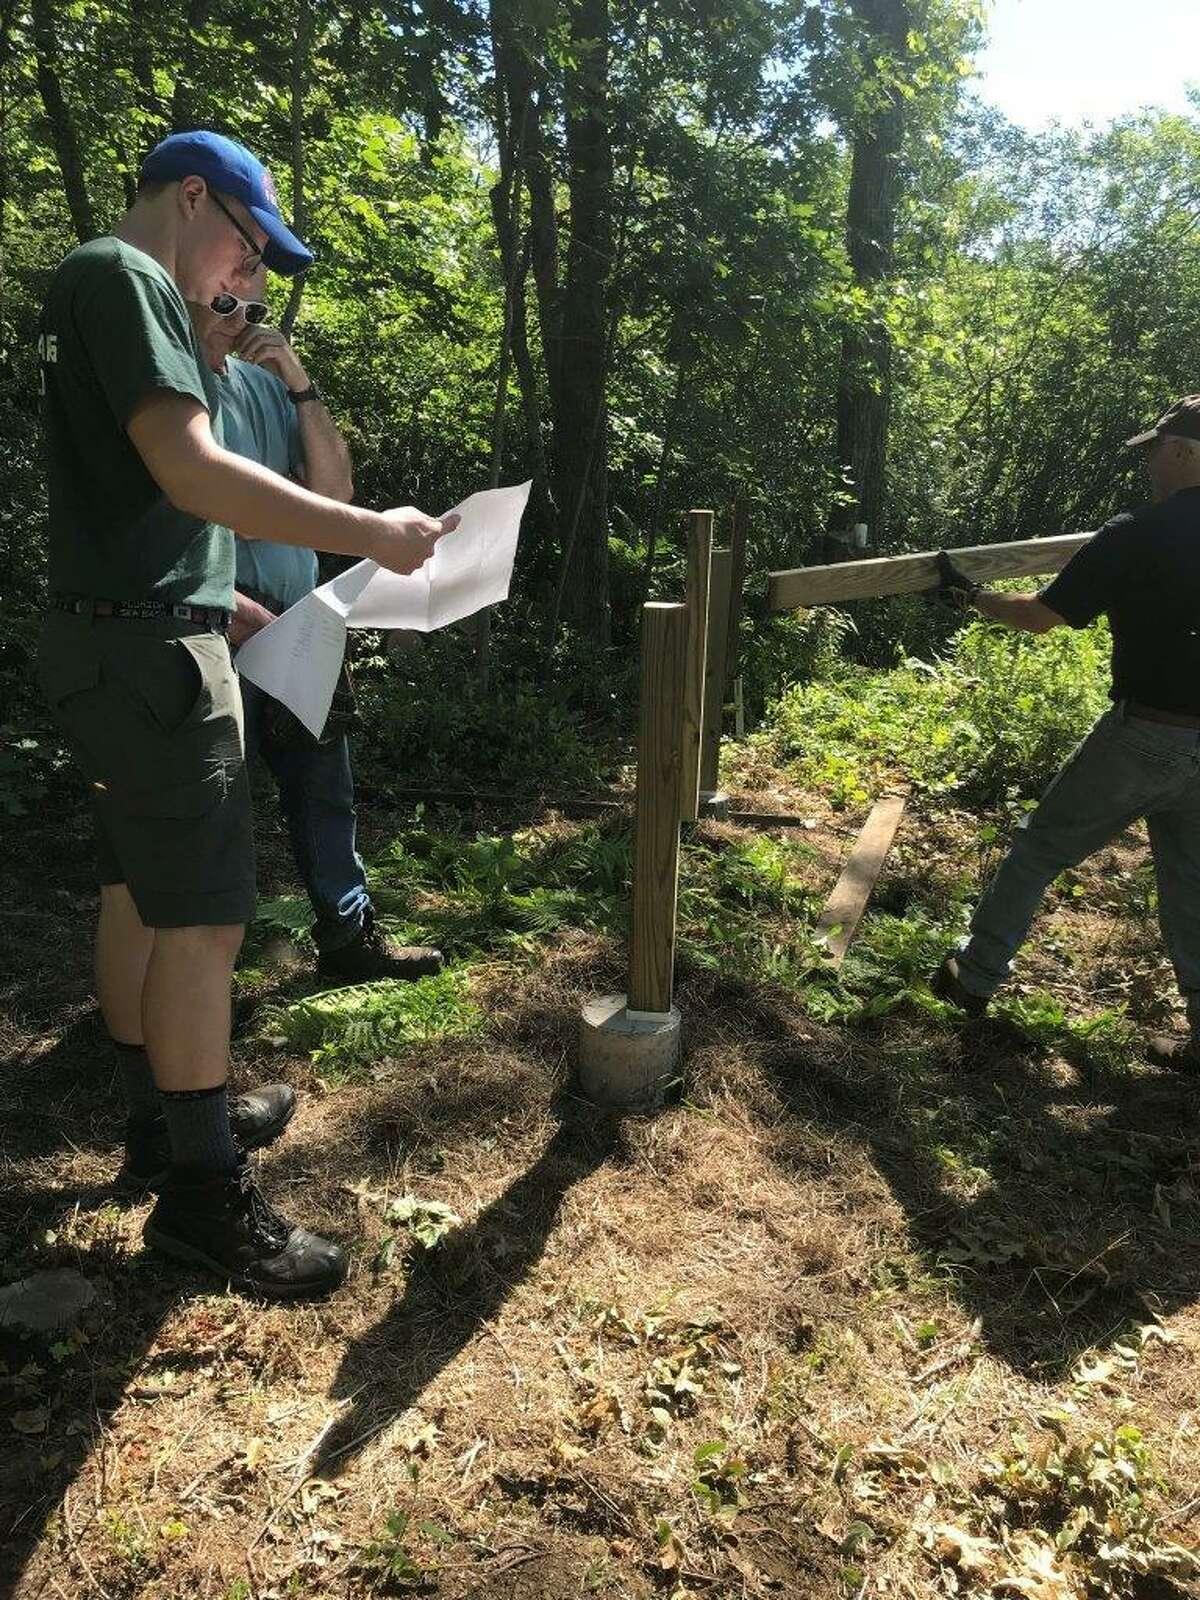 Boy Scout Joseph Sefcik discusses the plans with his Eagle Scout project coach, Ed Pitcher.